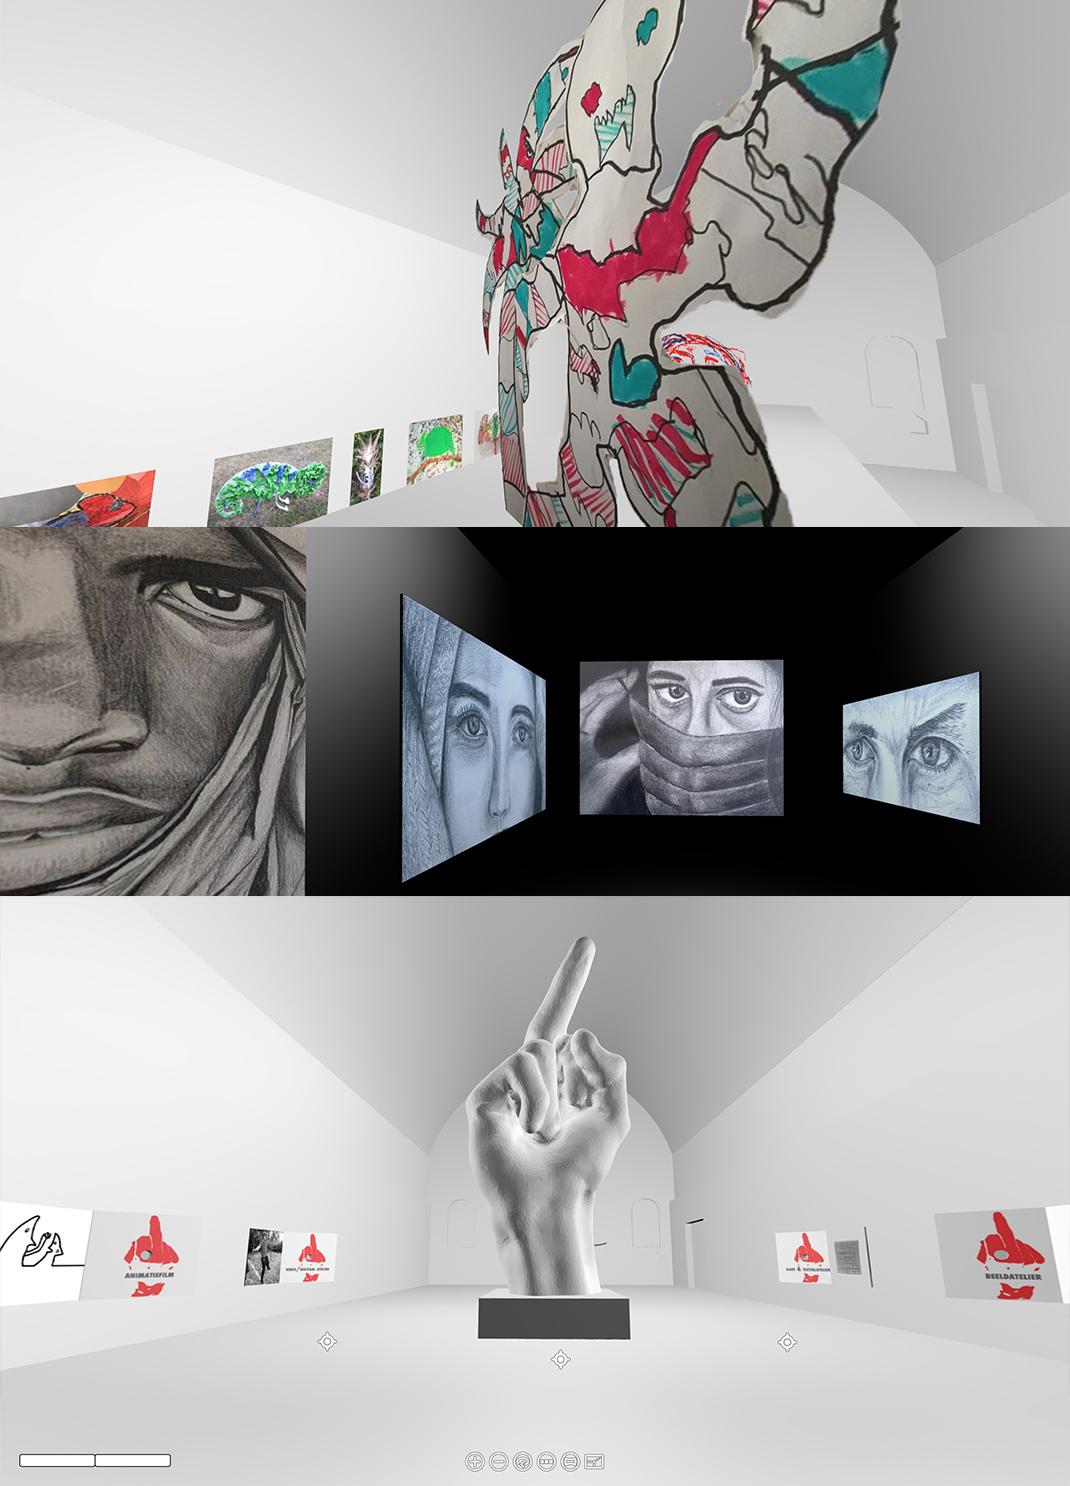 Virtuele tentoonstelling Creative Capture Covid-19 / Change[d] Time[s]